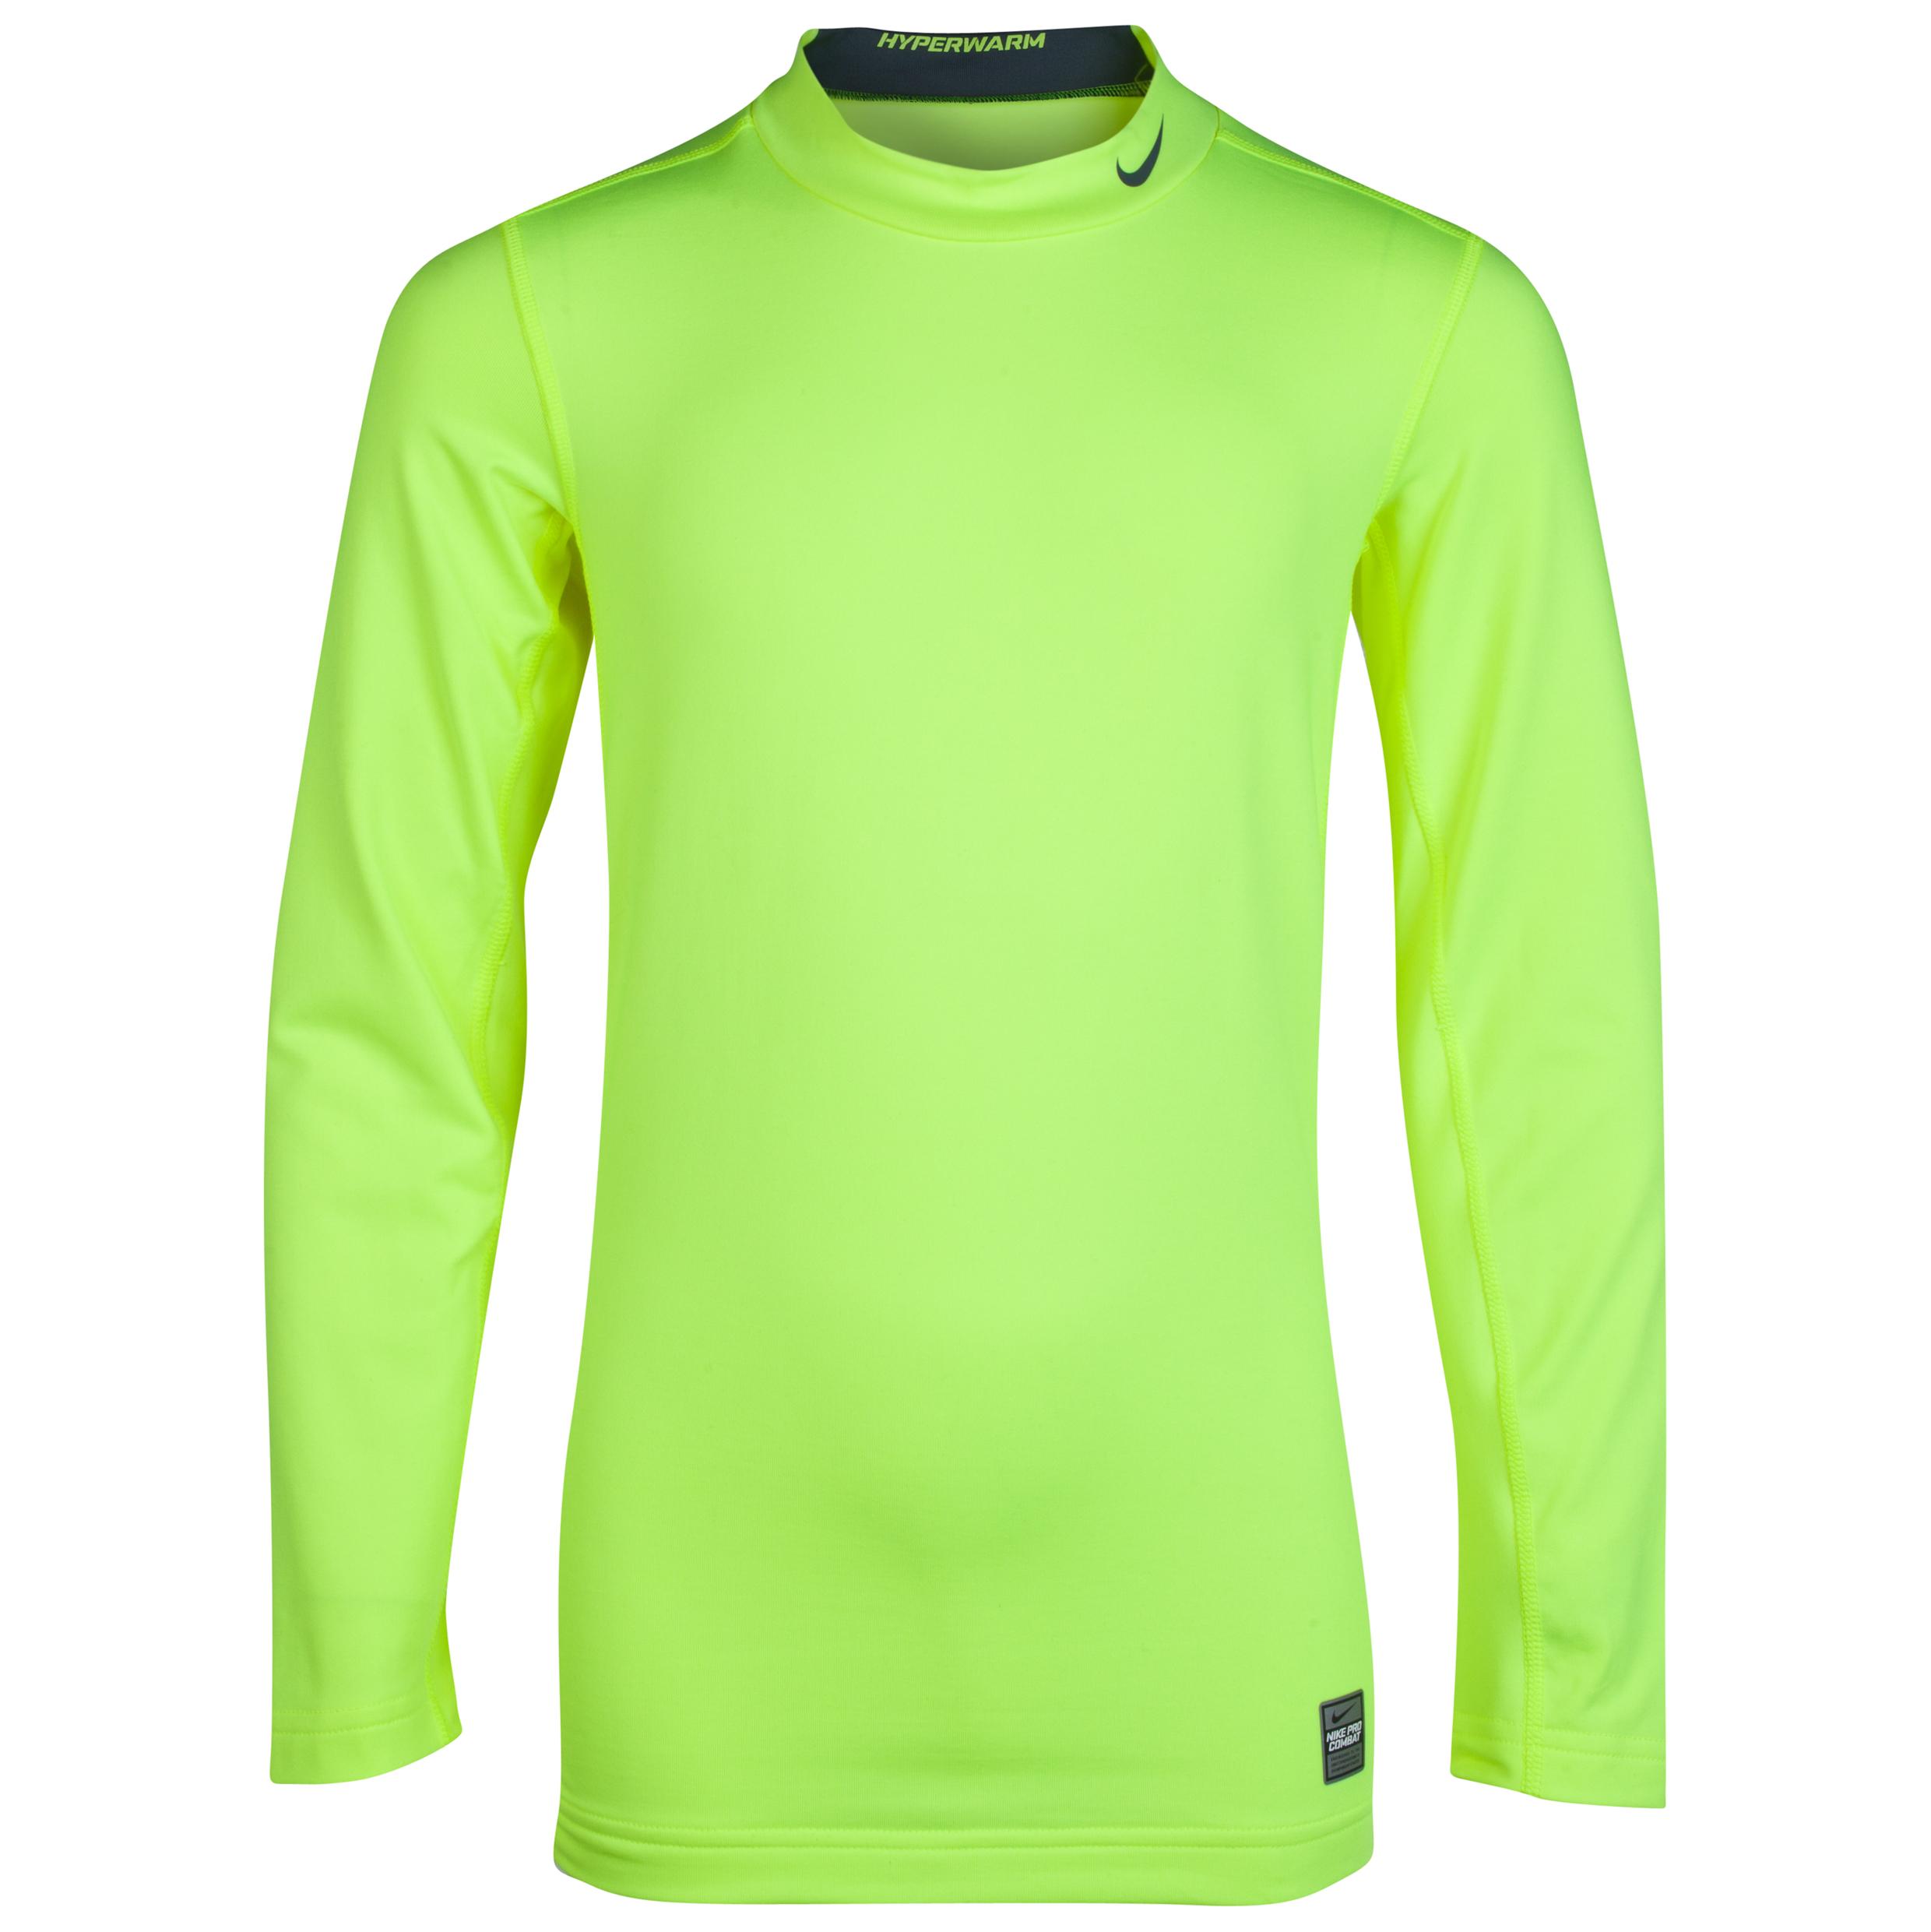 Nike Pro Combat Hyperwarm Comp Mock - Long Sleeve- Volt/Armory Slate/Armory Slate Lt Green